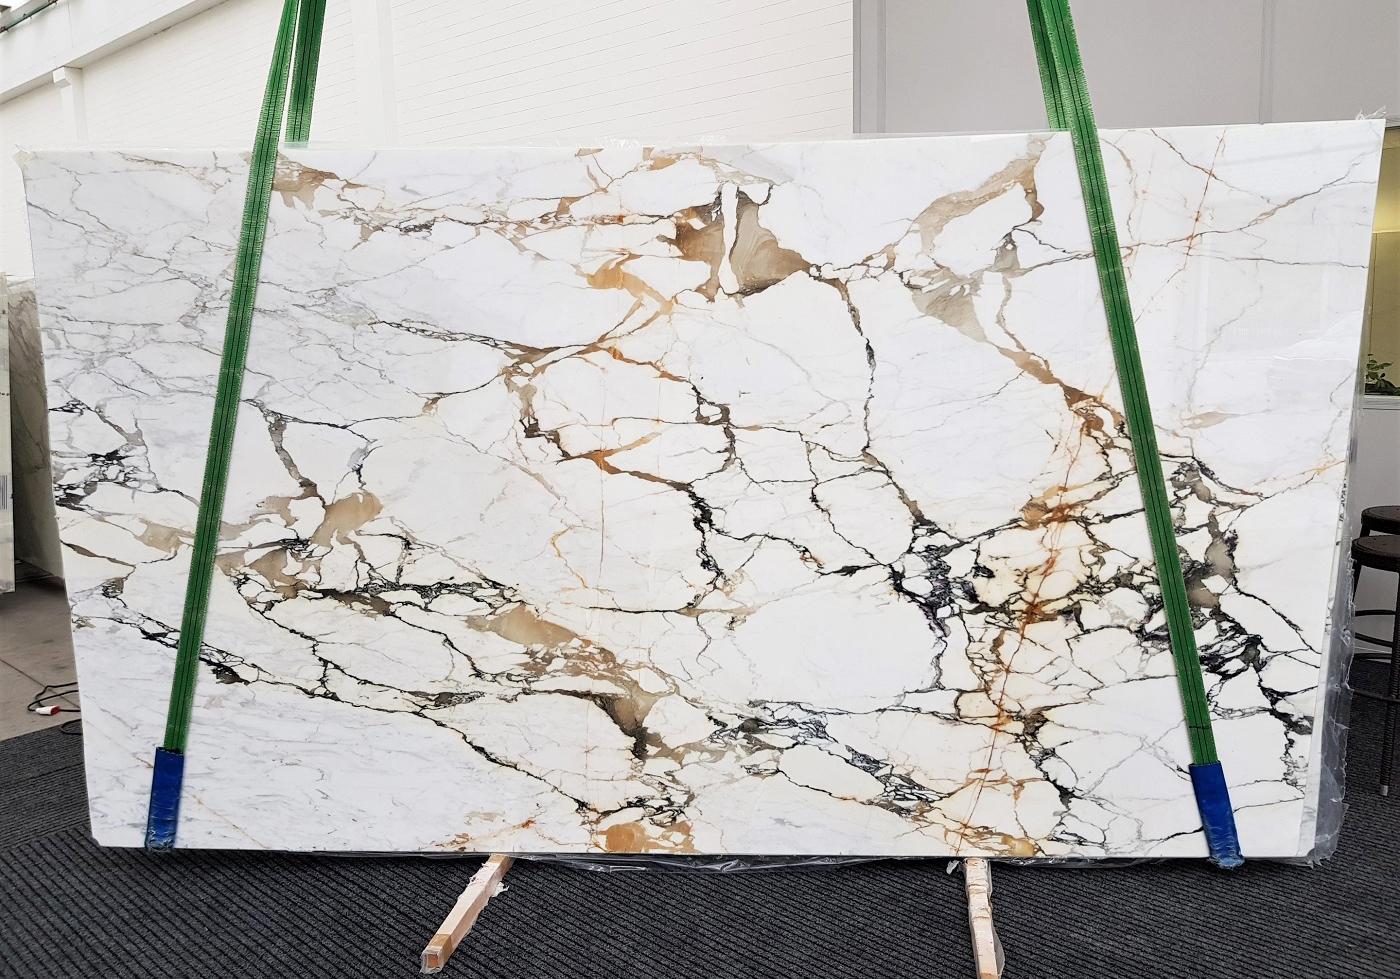 CALACATTA MACCHIAVECCHIA Suministro Verona (Italia) de planchas pulidas en mármol natural GL 1131 , Bundle #6